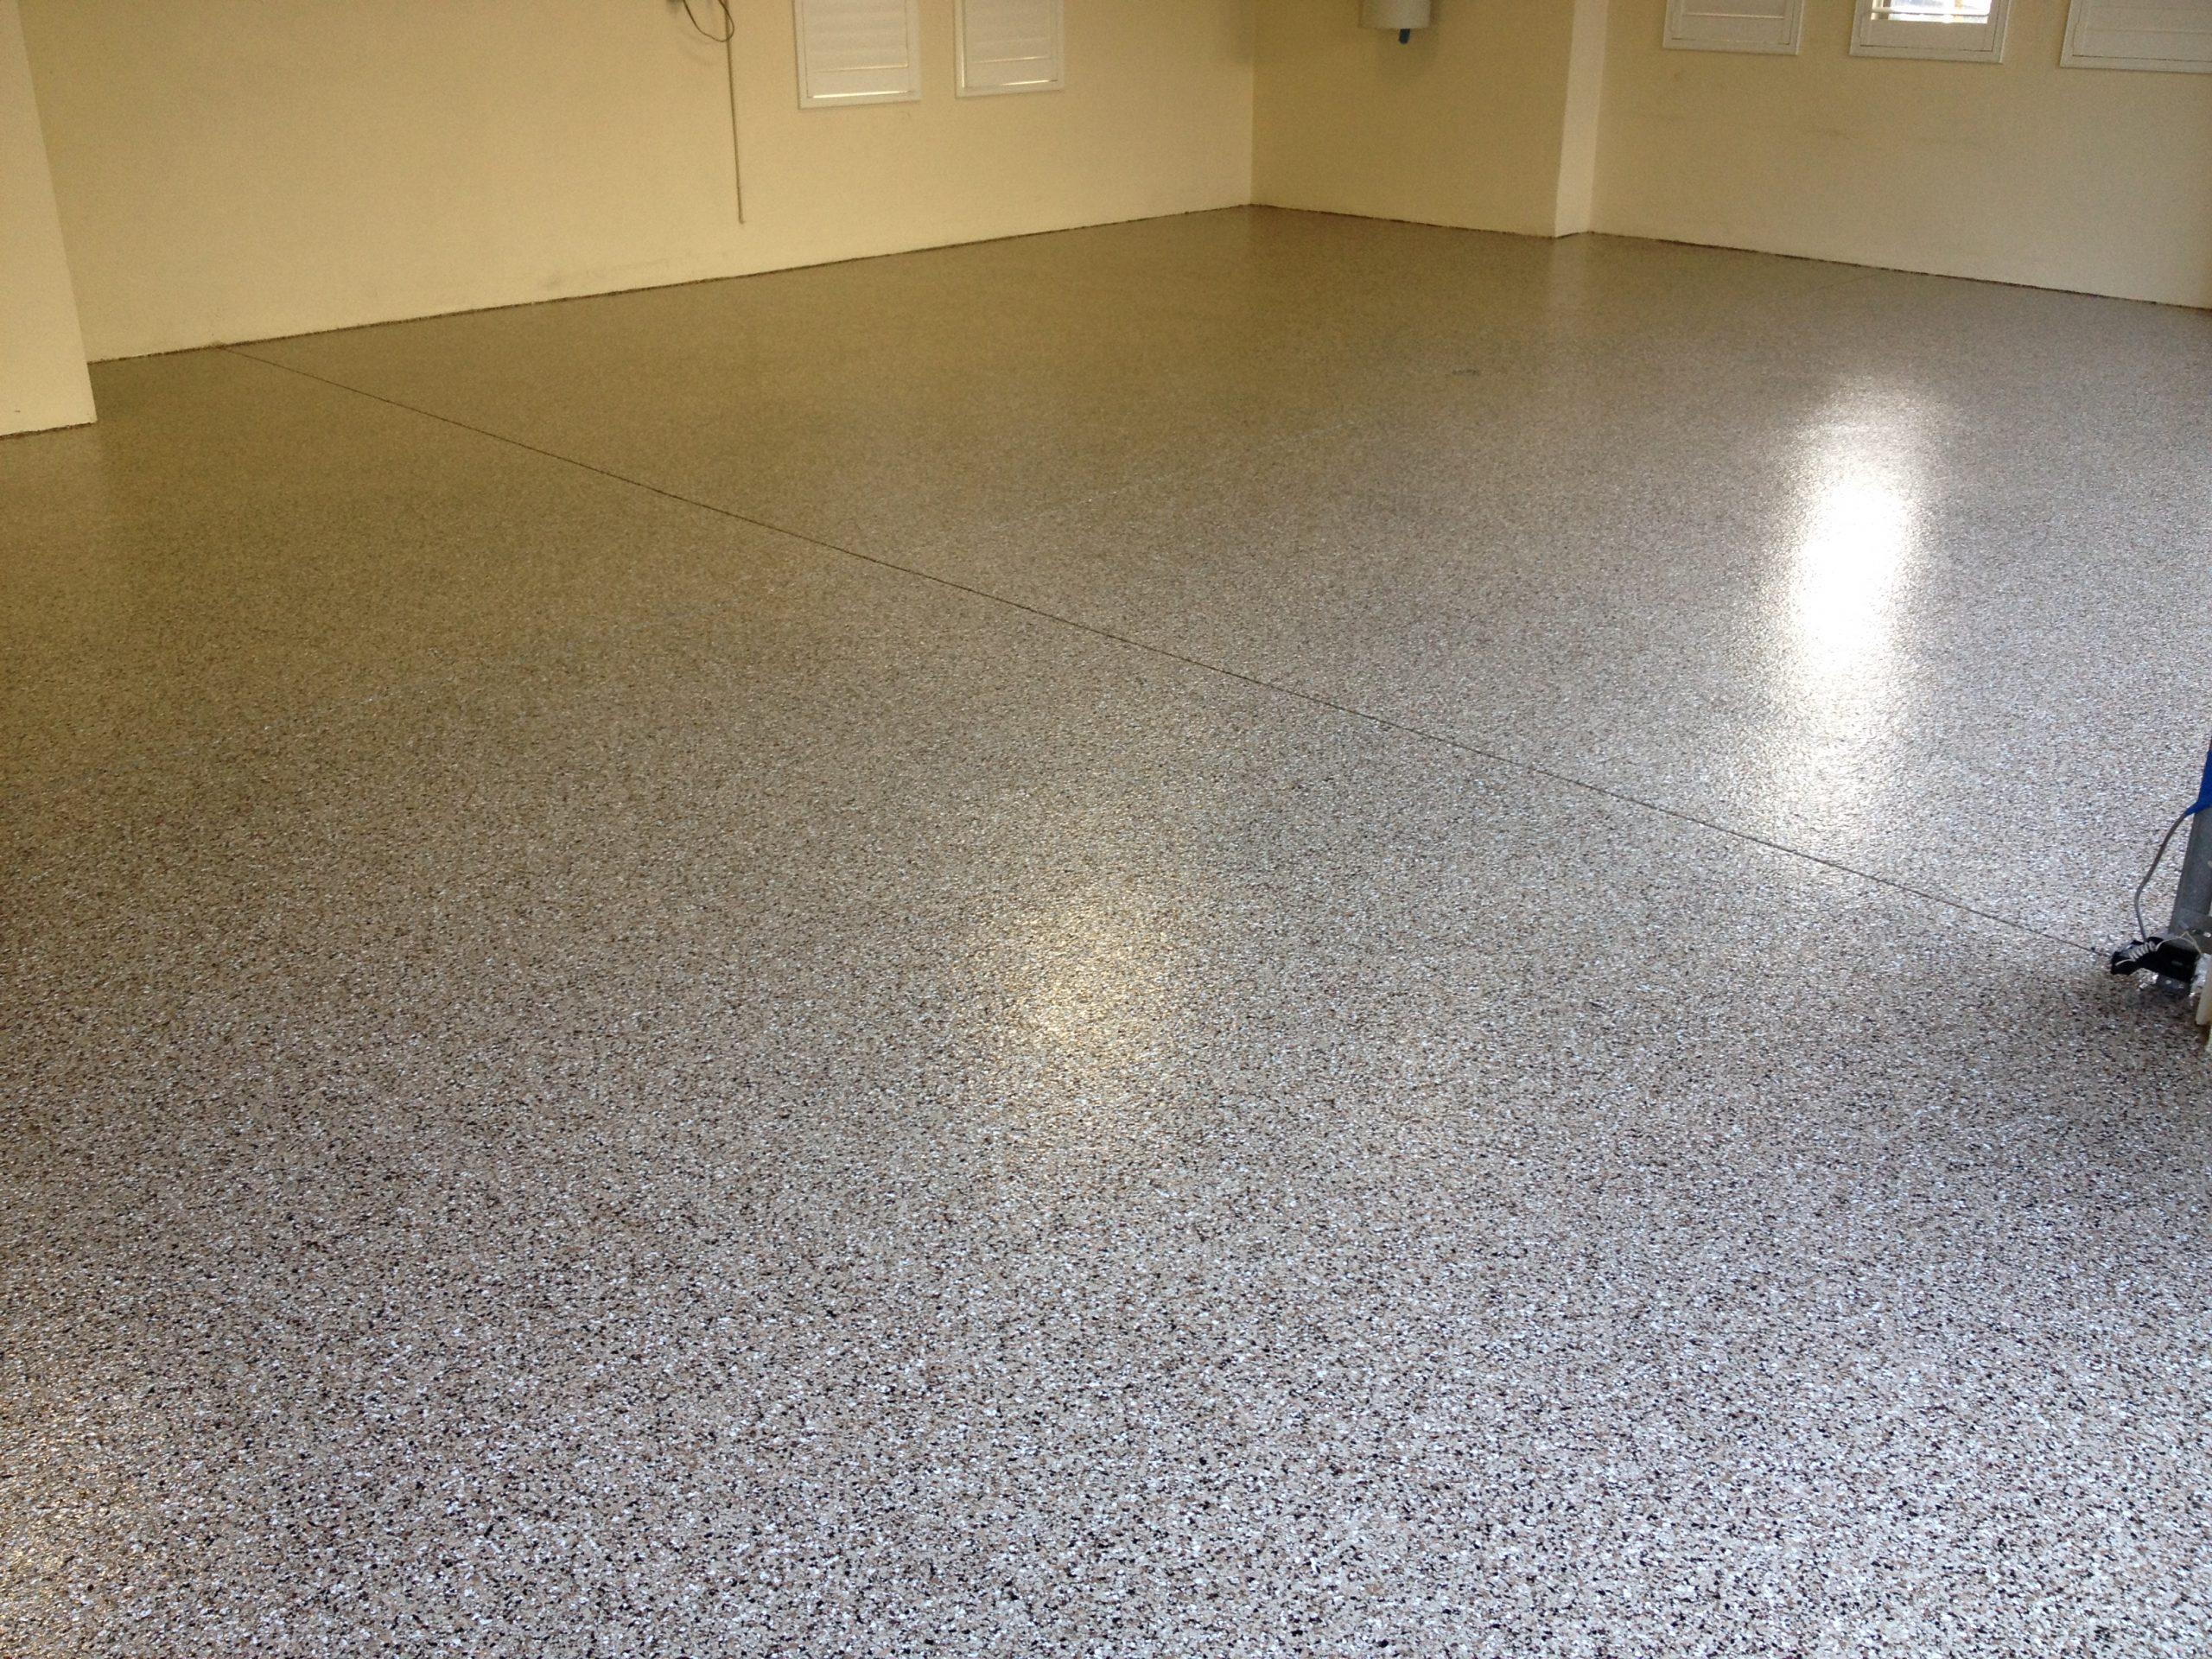 Garage Doctors Easy Clean Flooring in Florida Platinum-Flake-Epoxy